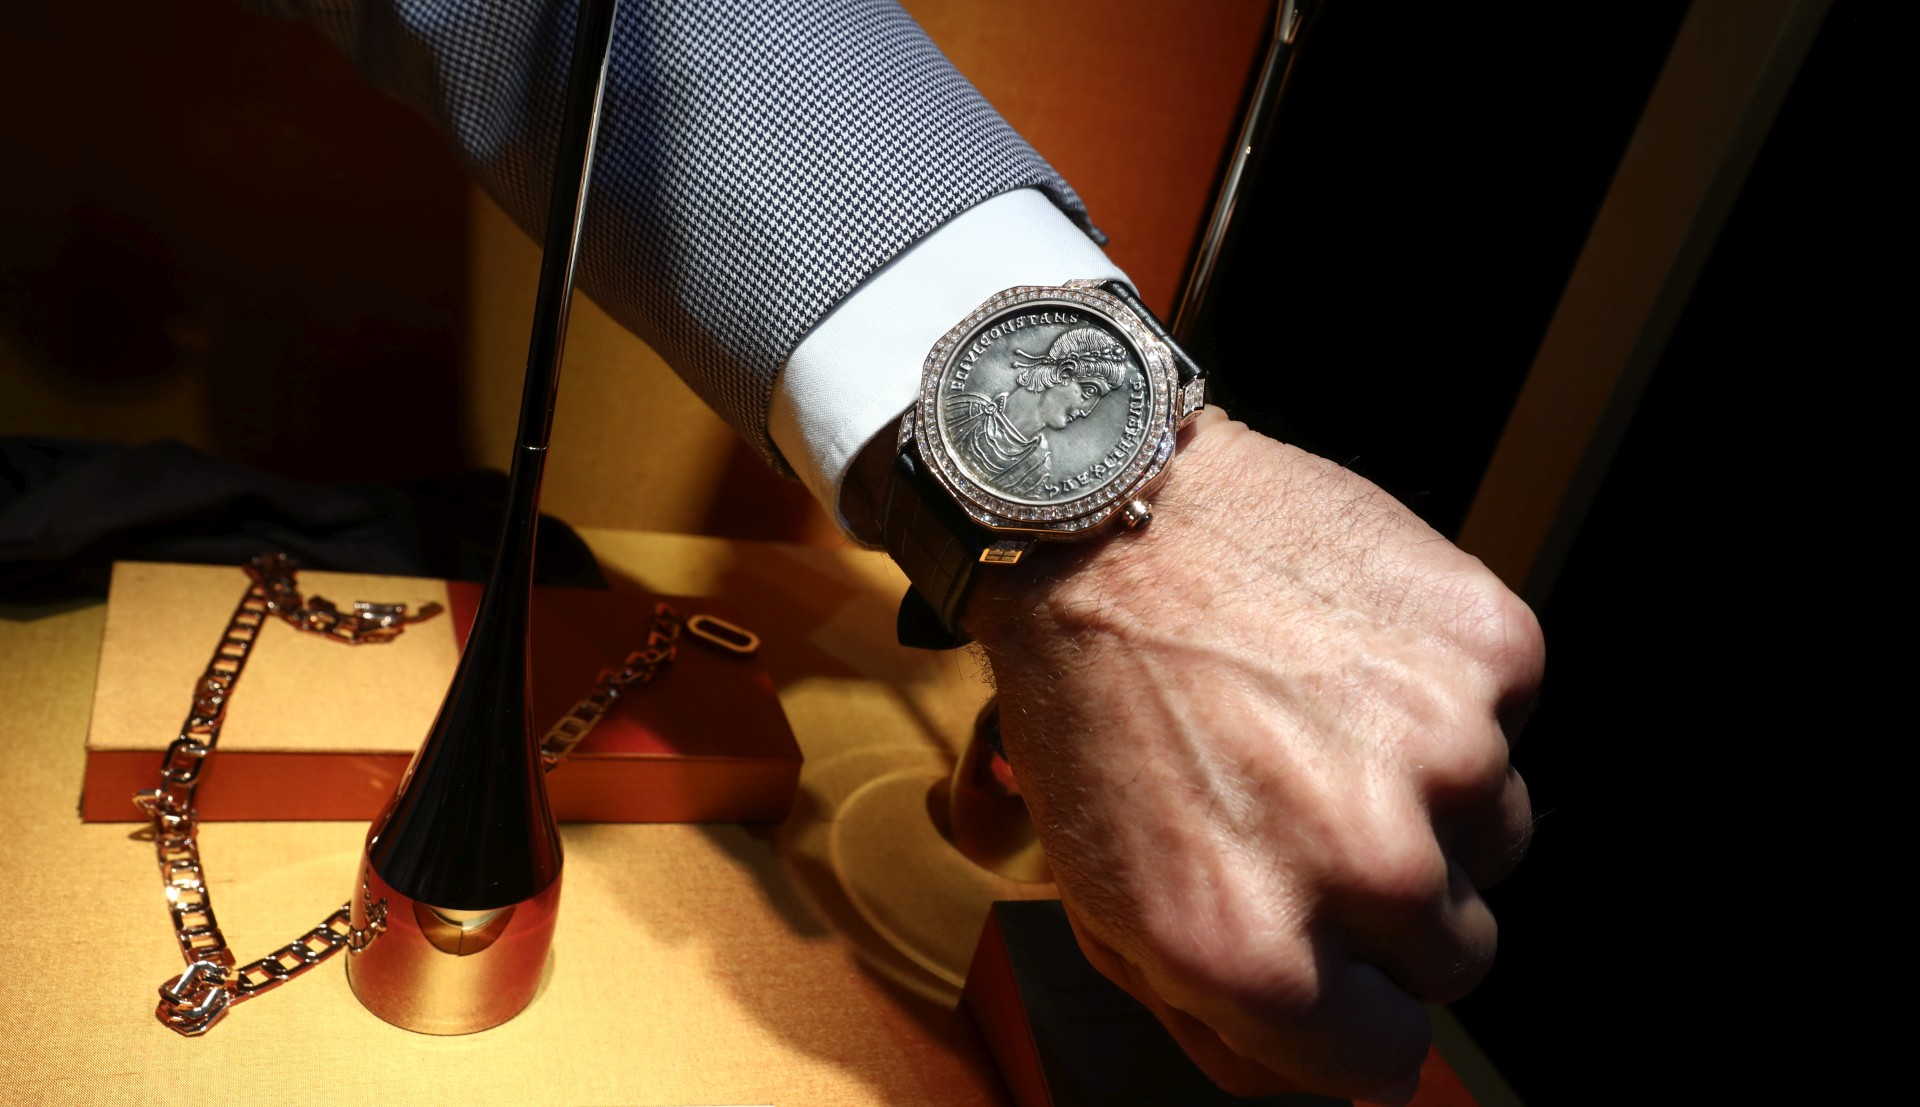 BVLGARI於上海舉辦複雜腕錶鑑賞會,發表2018年度腕錶新作